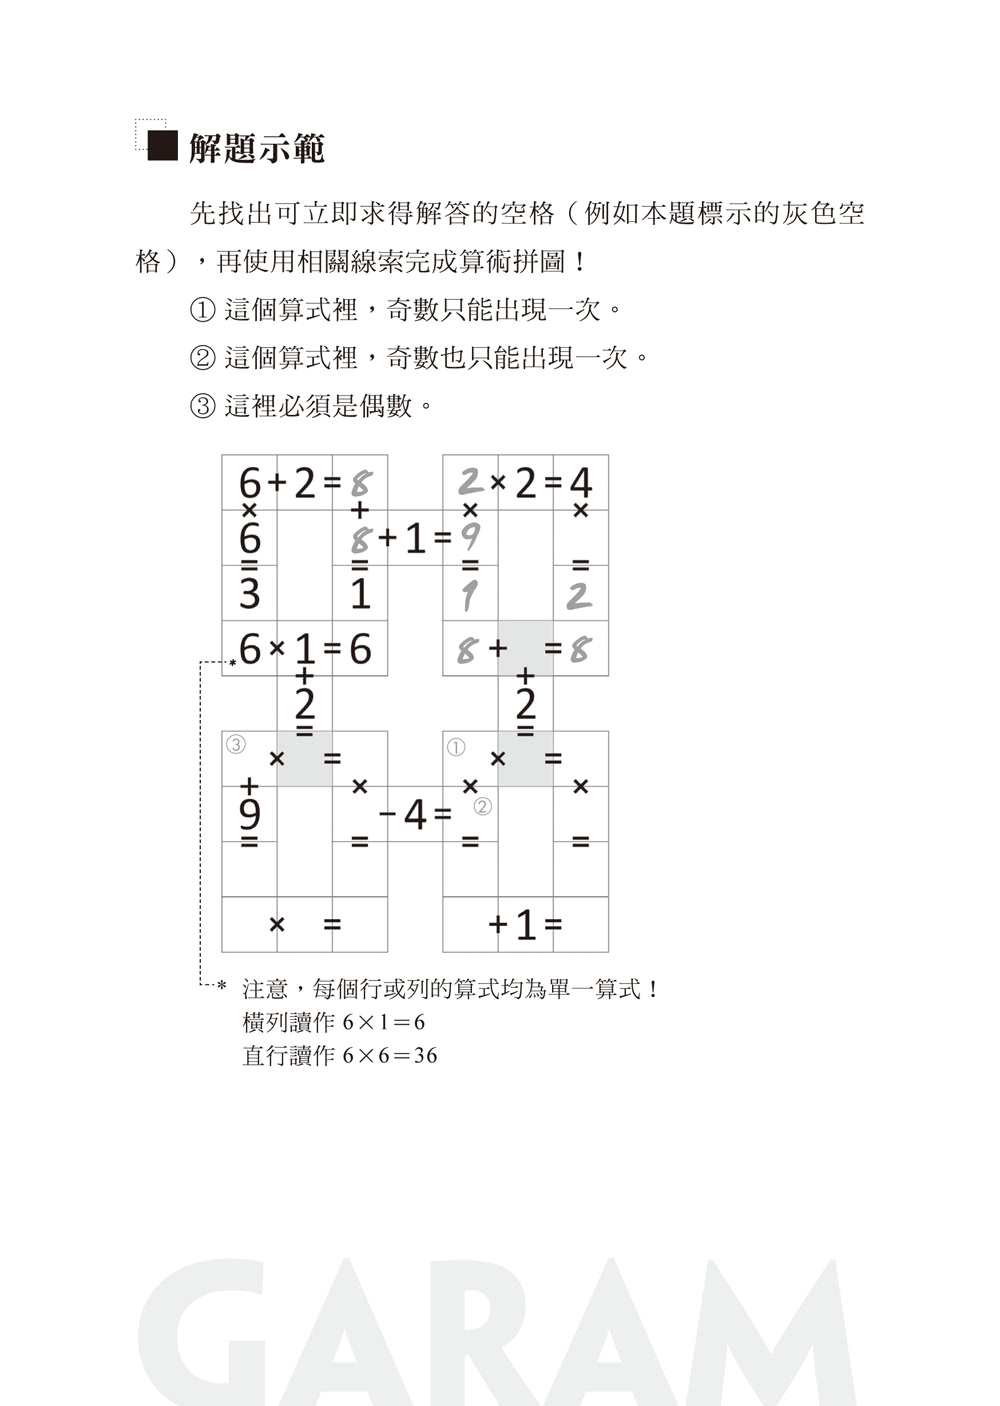 GARAM頂尖的算術拼圖:超直觀高階邏輯運算 激盪、啟發你的數感